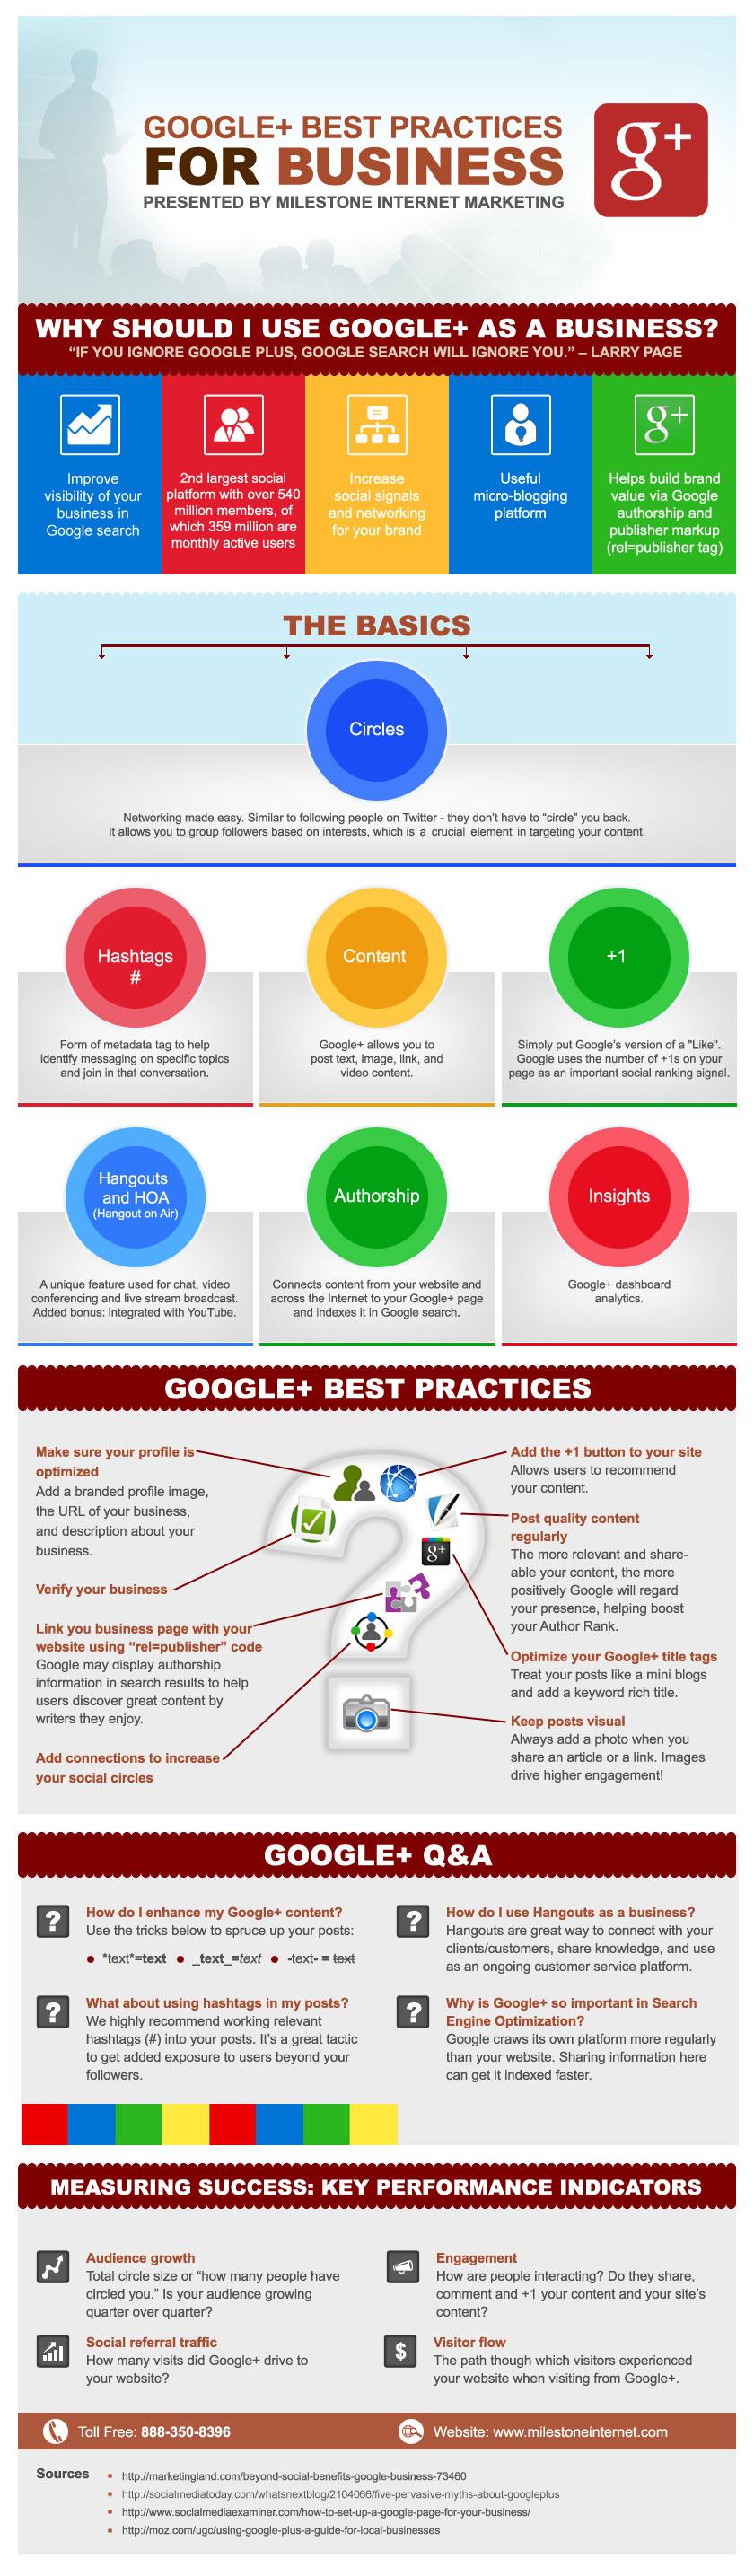 Buenas prácticas en Google + para empresas